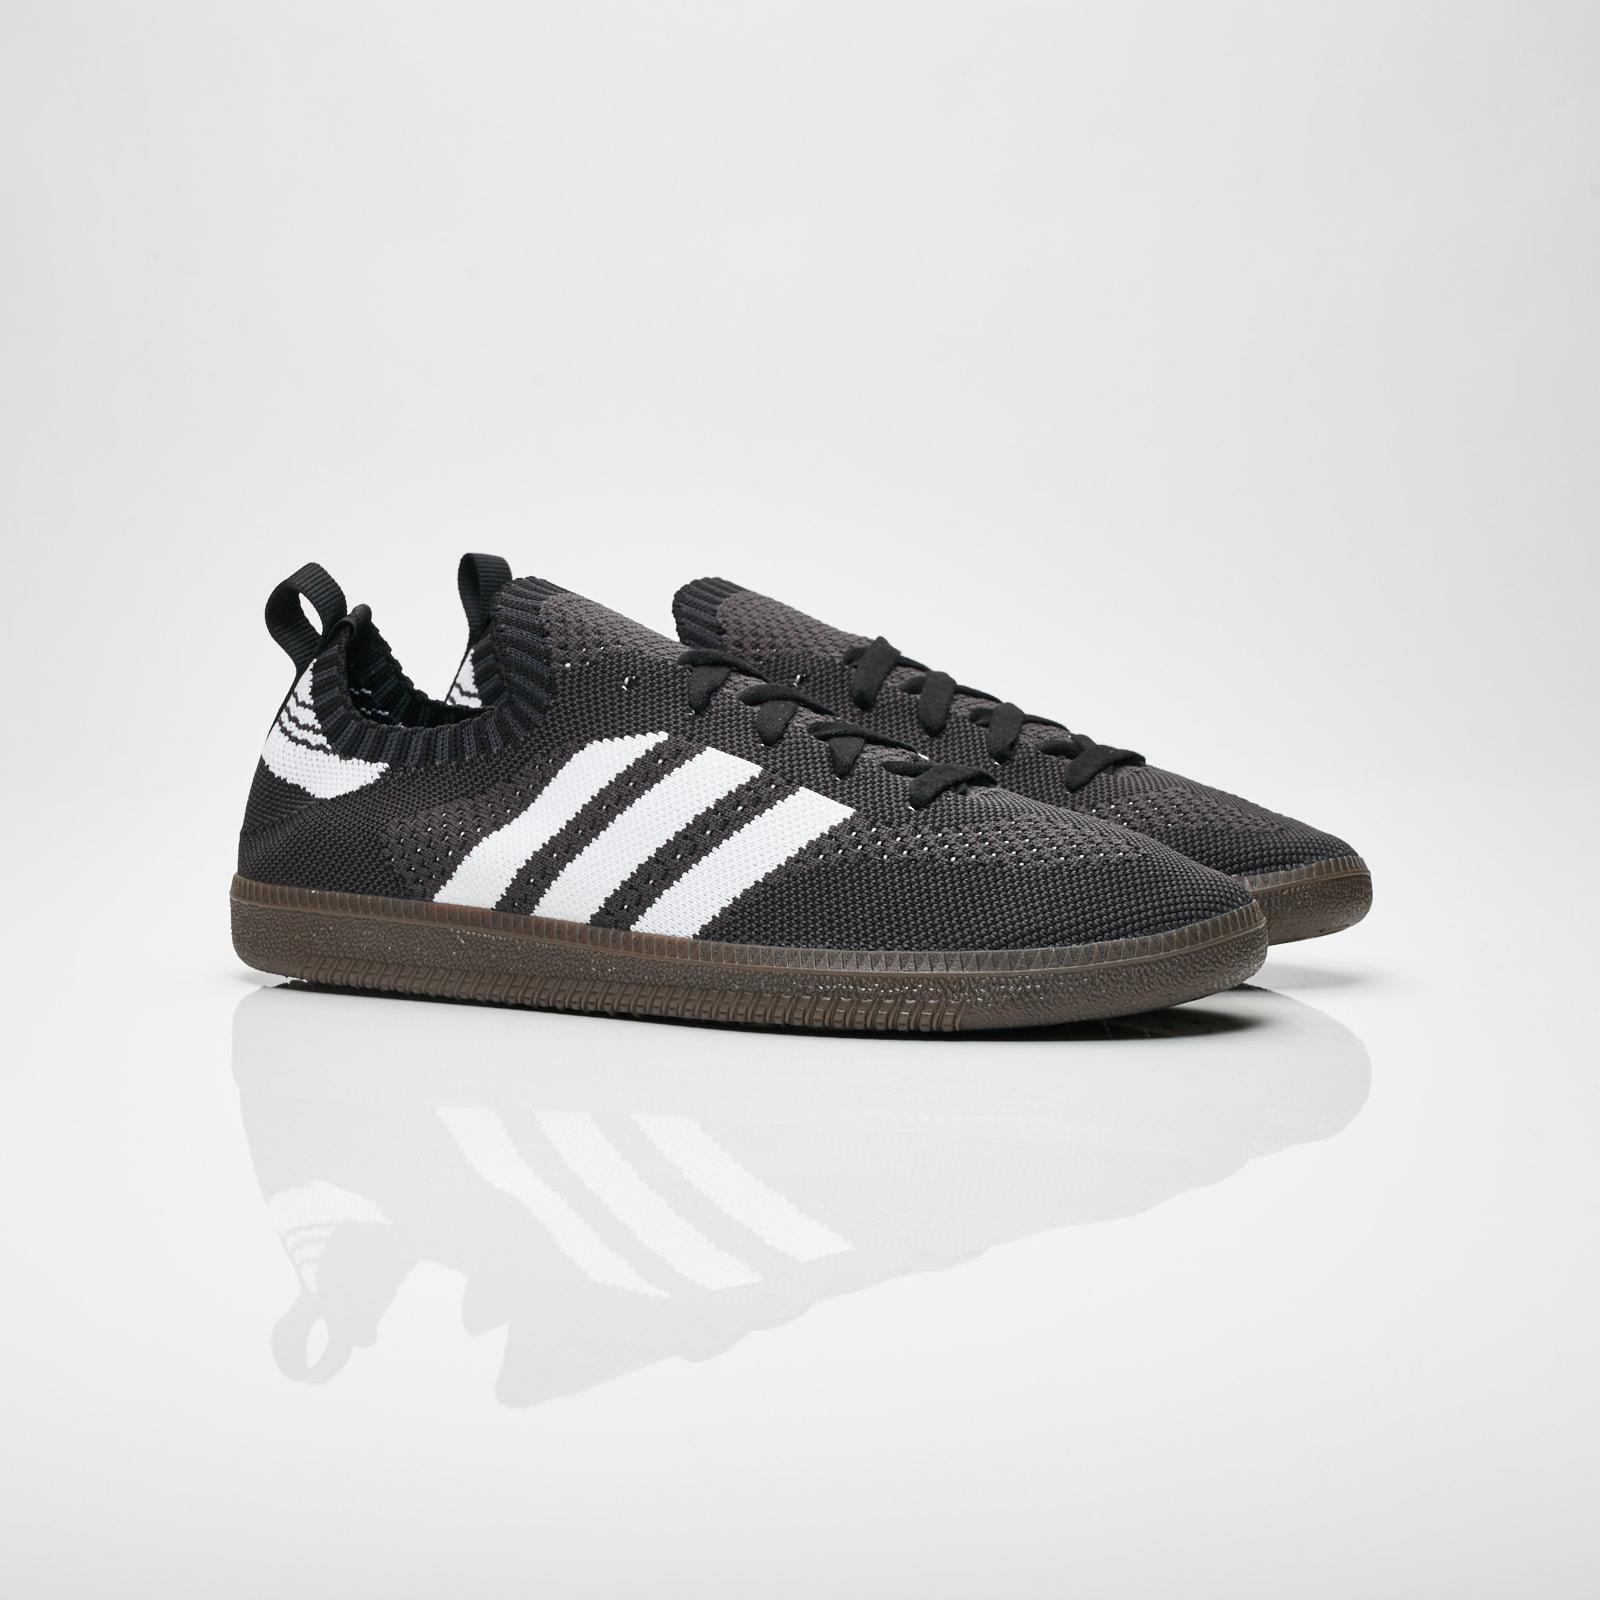 de28707ce6fa84 adidas Samba PK Sock - Cq2218 - Sneakersnstuff